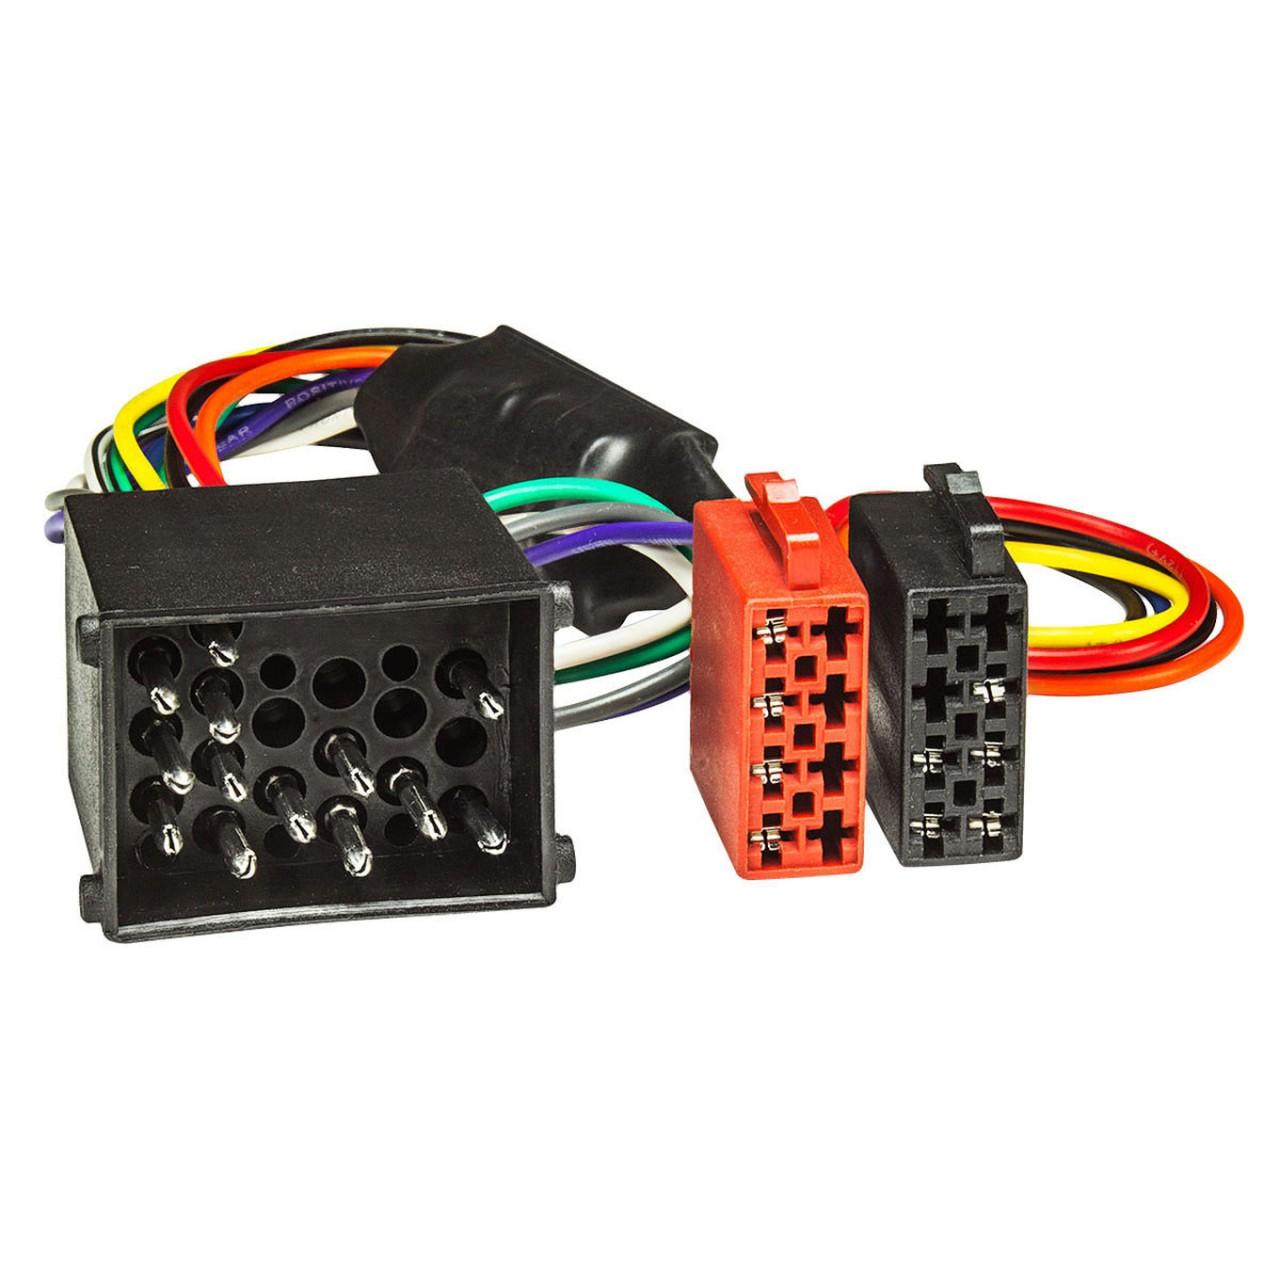 JAYKS | Radio-Adapter-Kabel + mini Fakra | für BMW E46 u.a.